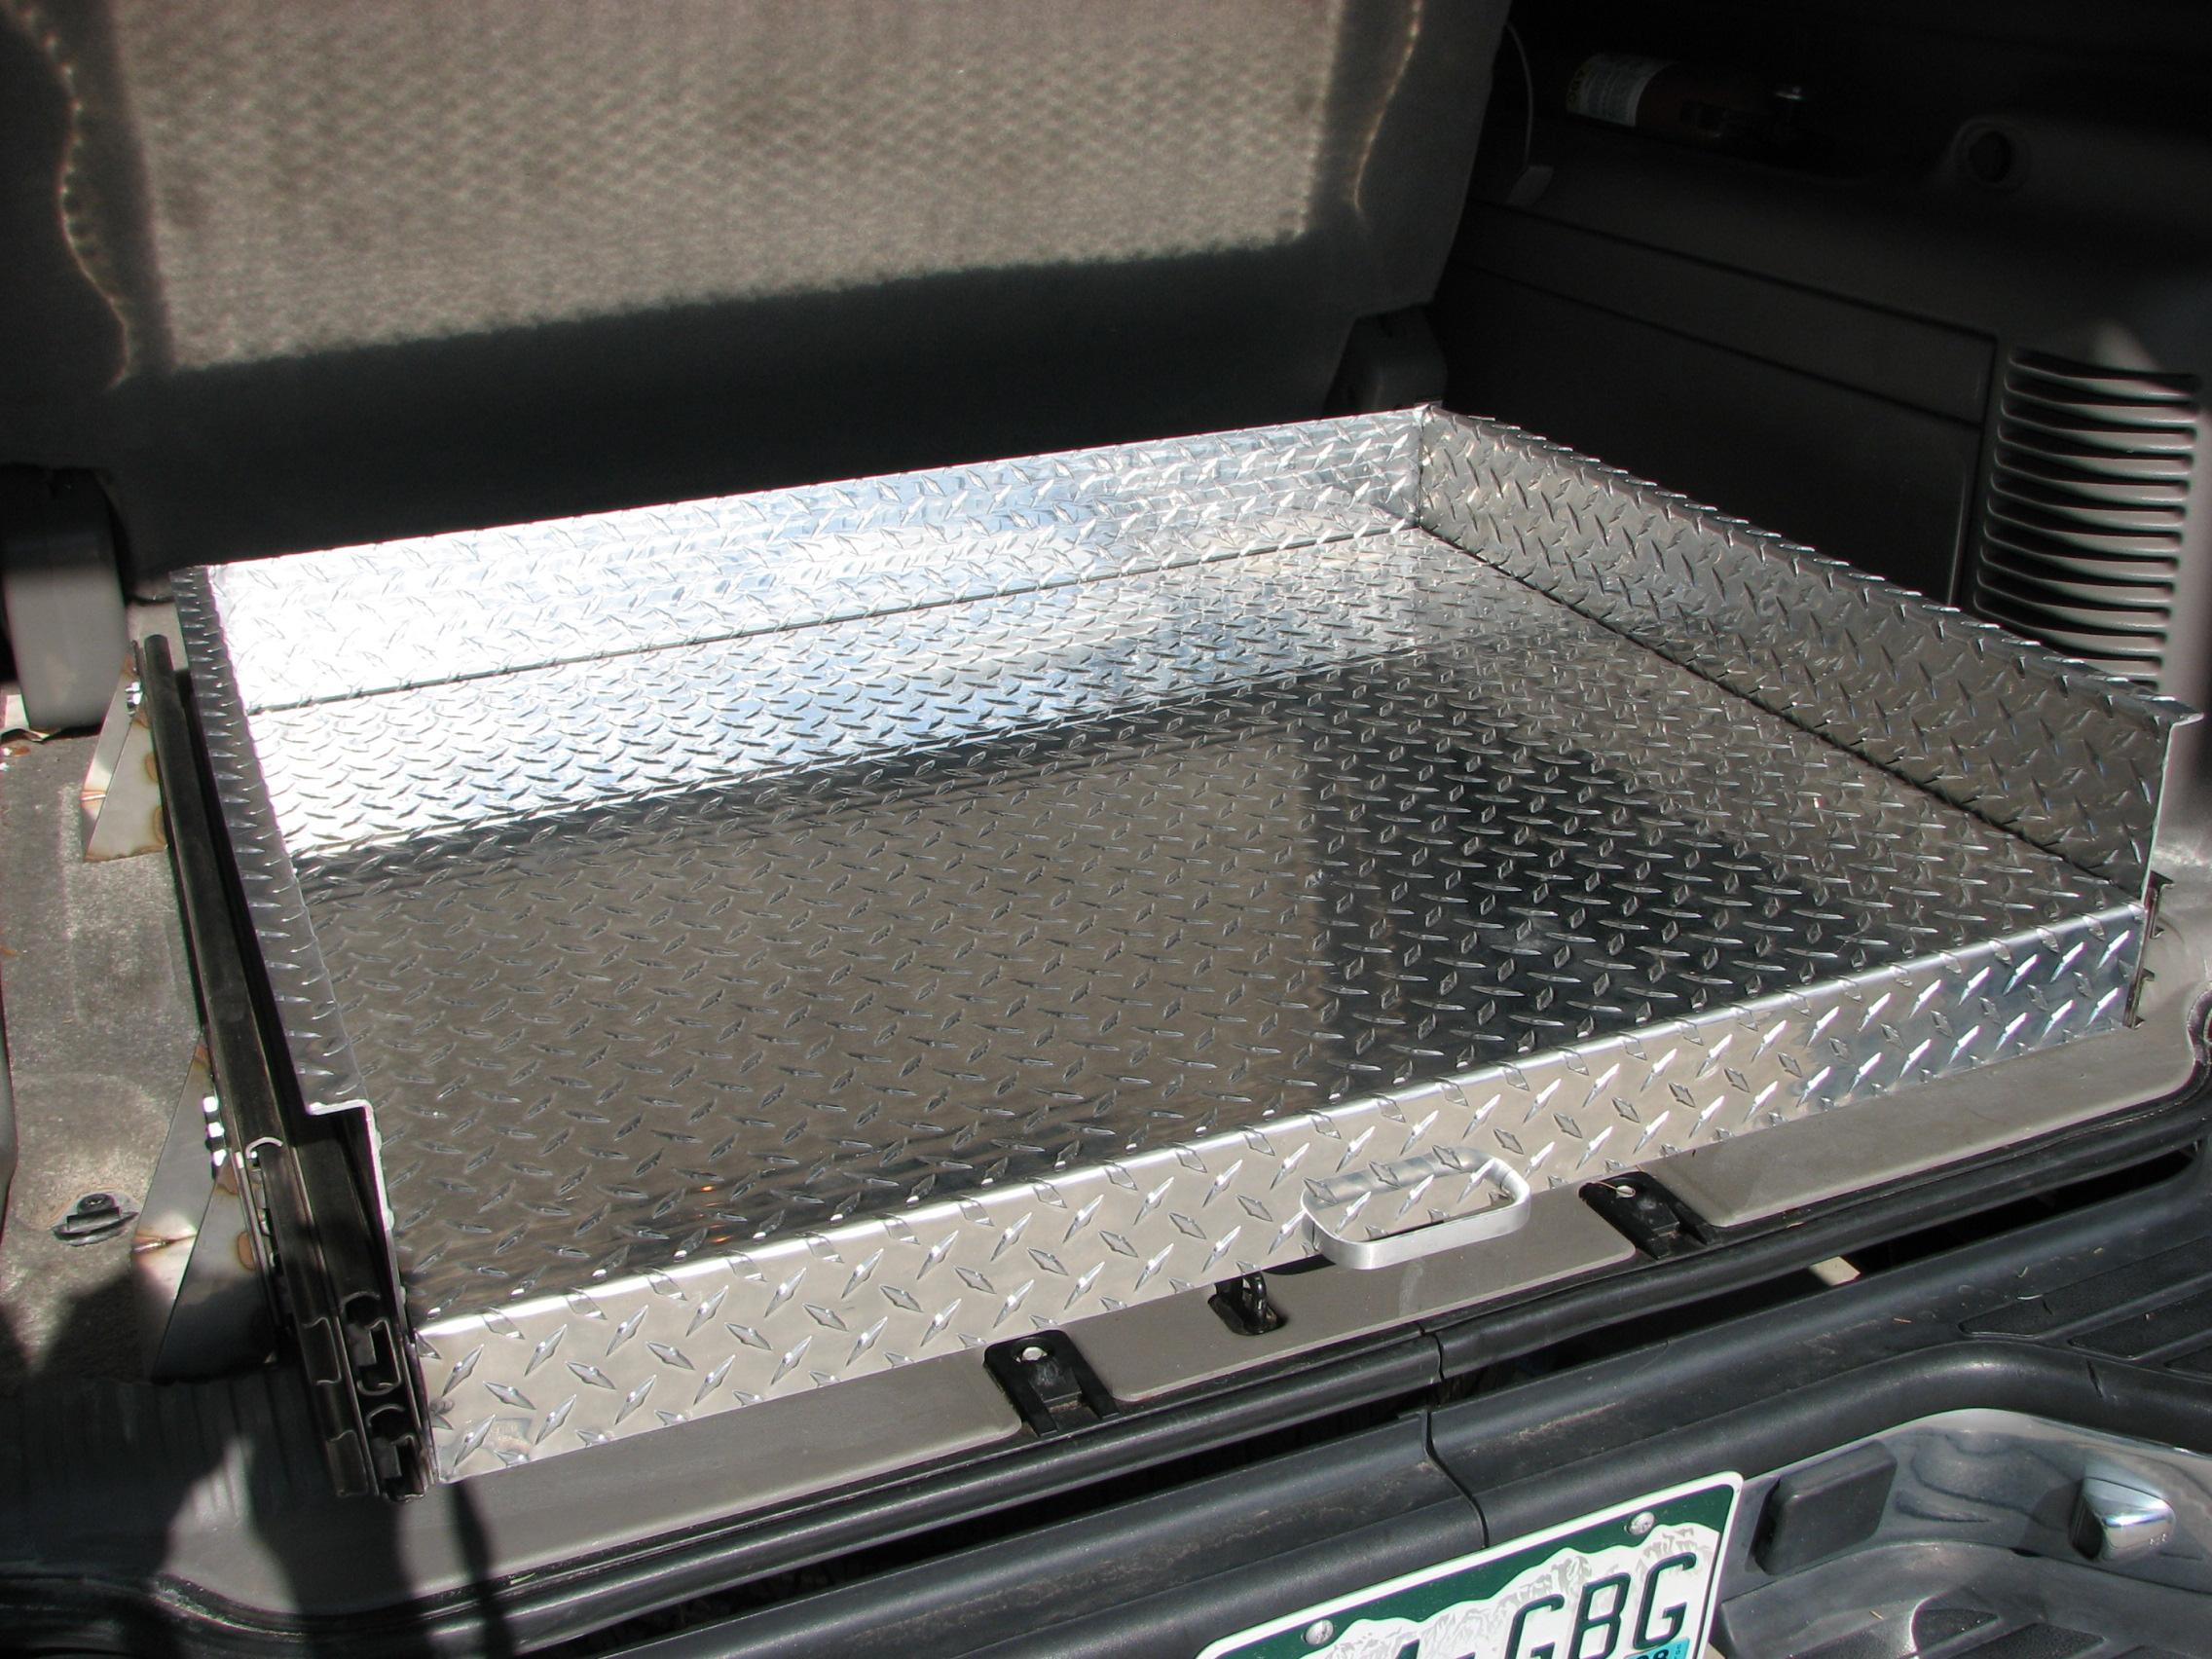 Caja de la camioneta Diapositivas ()